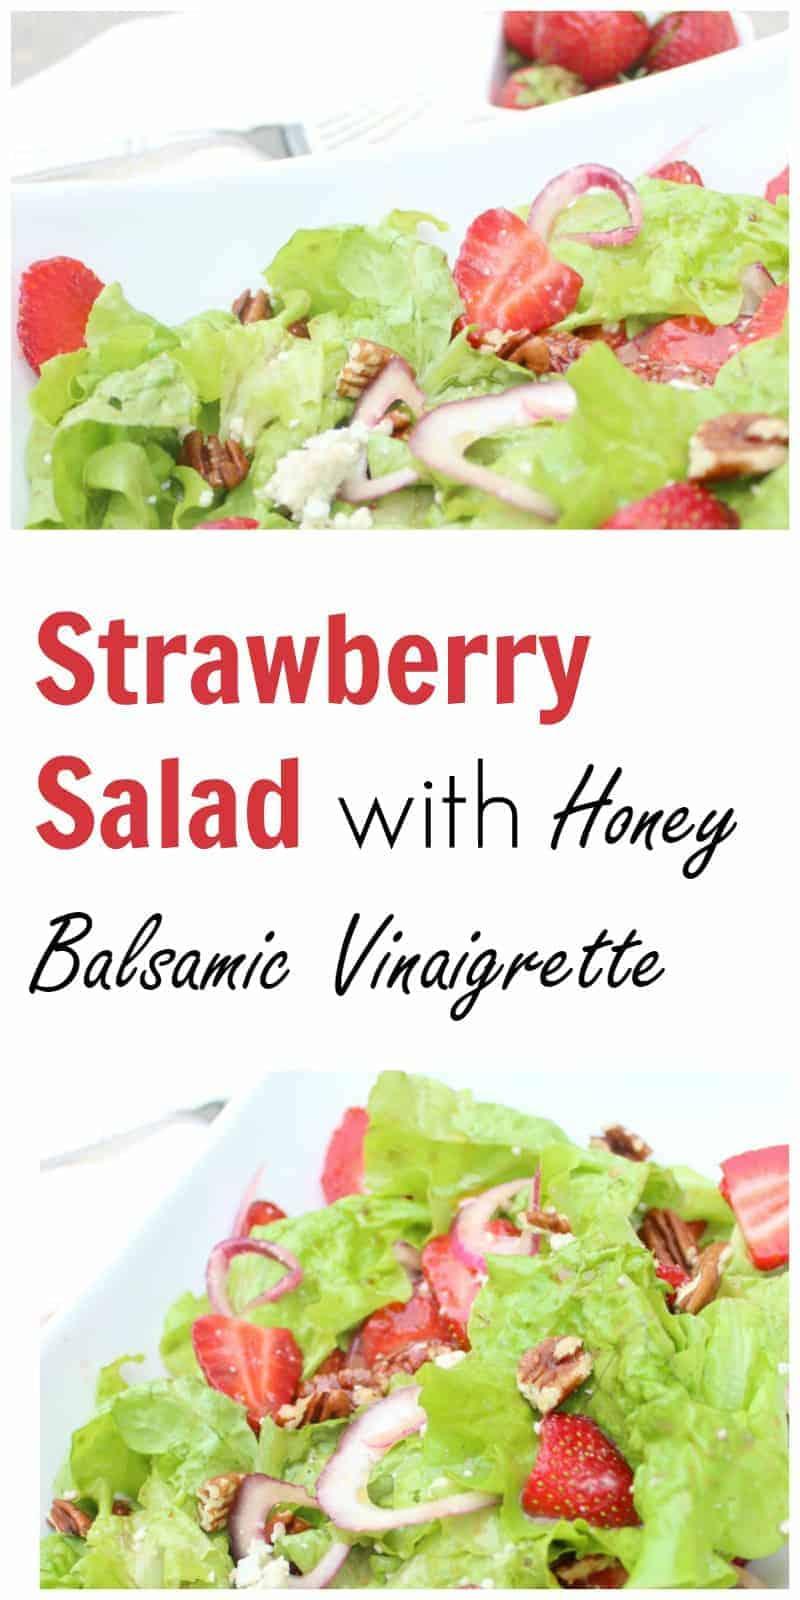 Strawberry salad with honey vanilla balsamic dressing